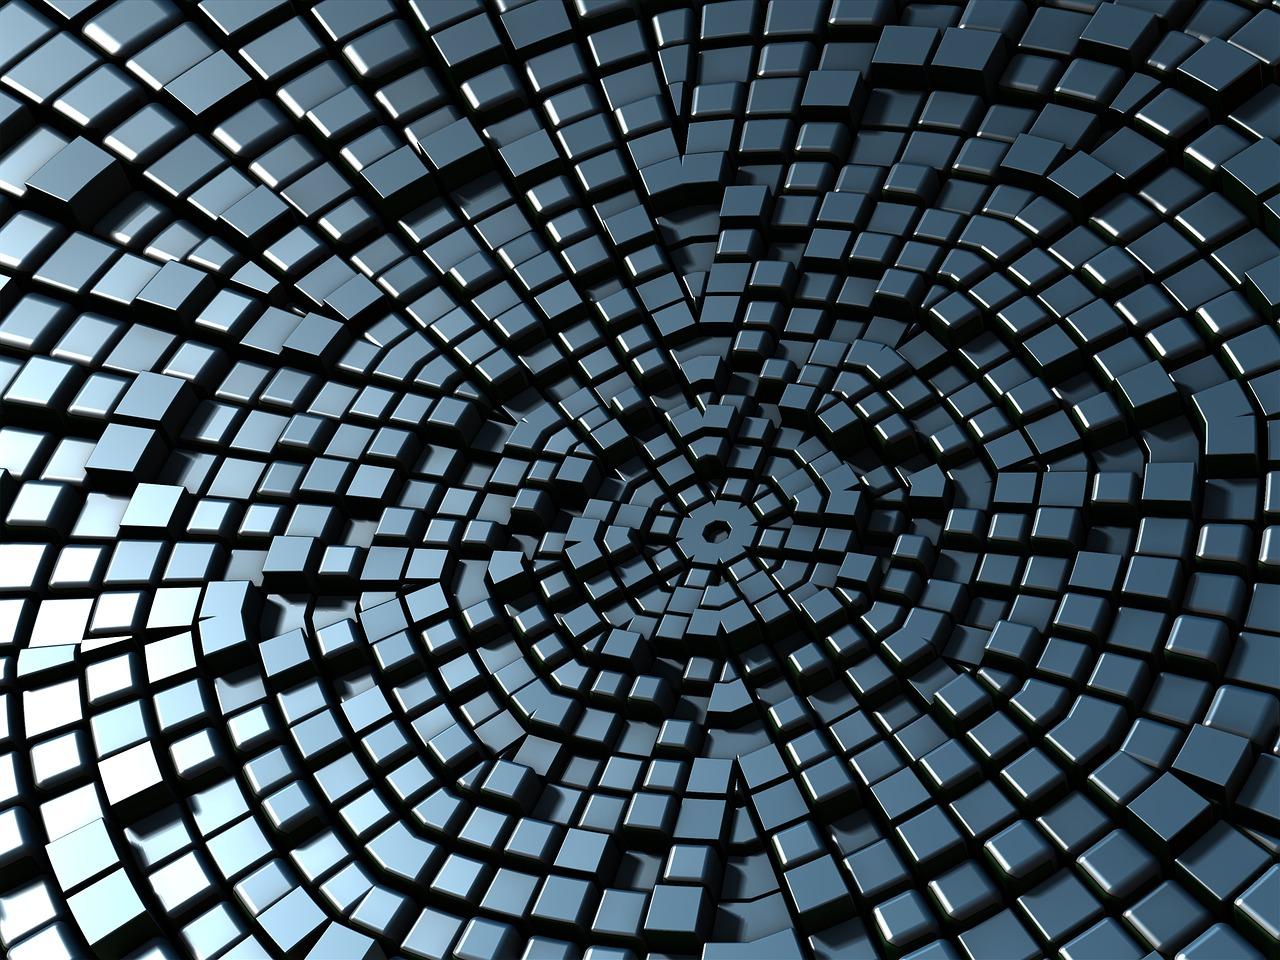 Cyberversicherung auswählen- Image by Pete Linforth from Pixabay